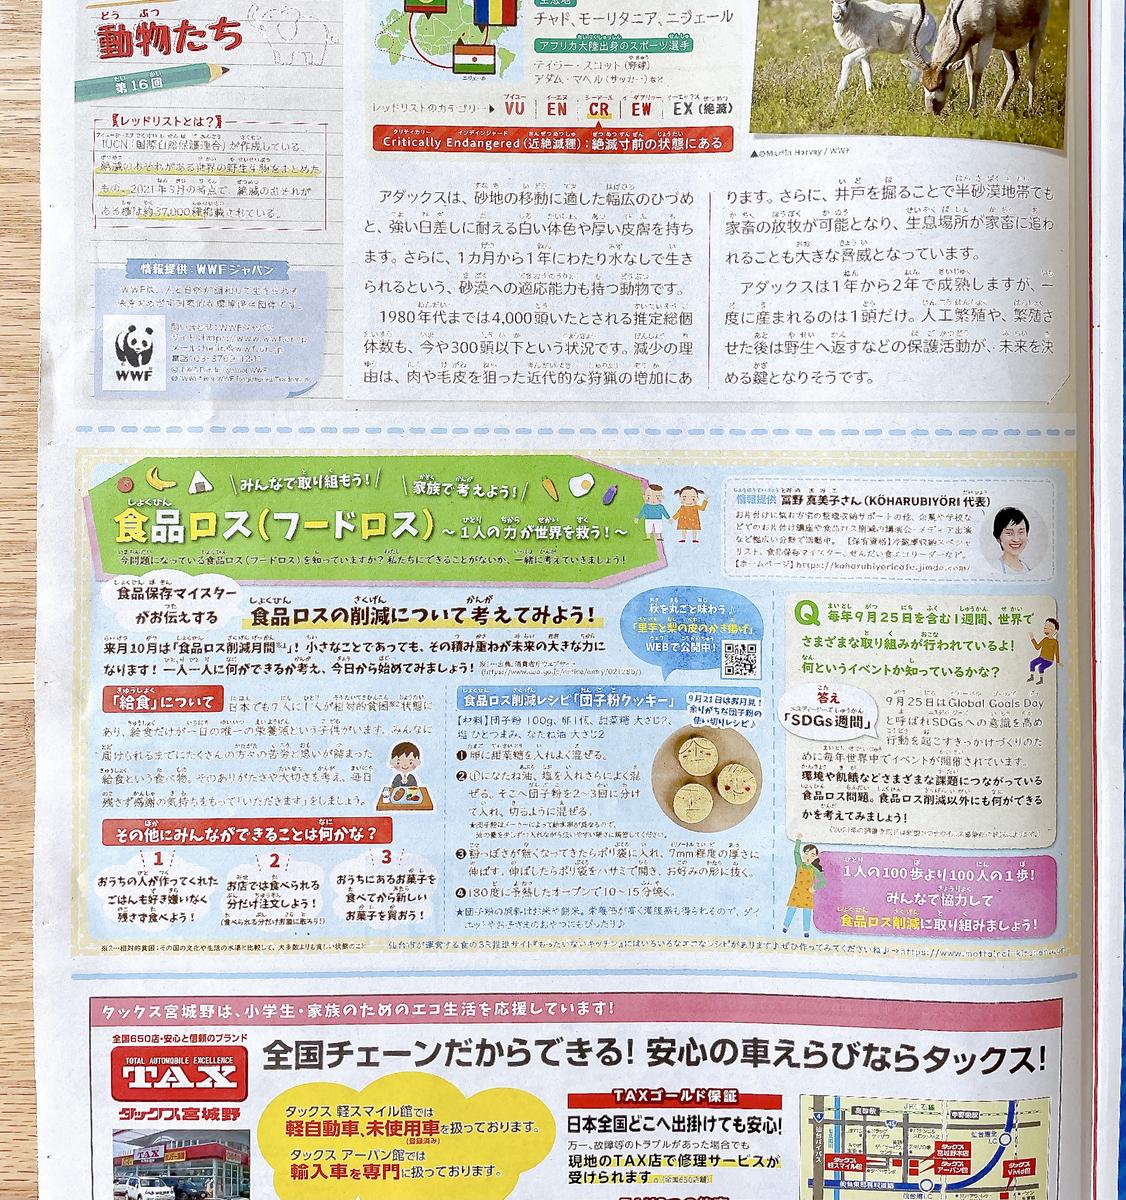 f:id:karumako8564:20210917104437j:plain